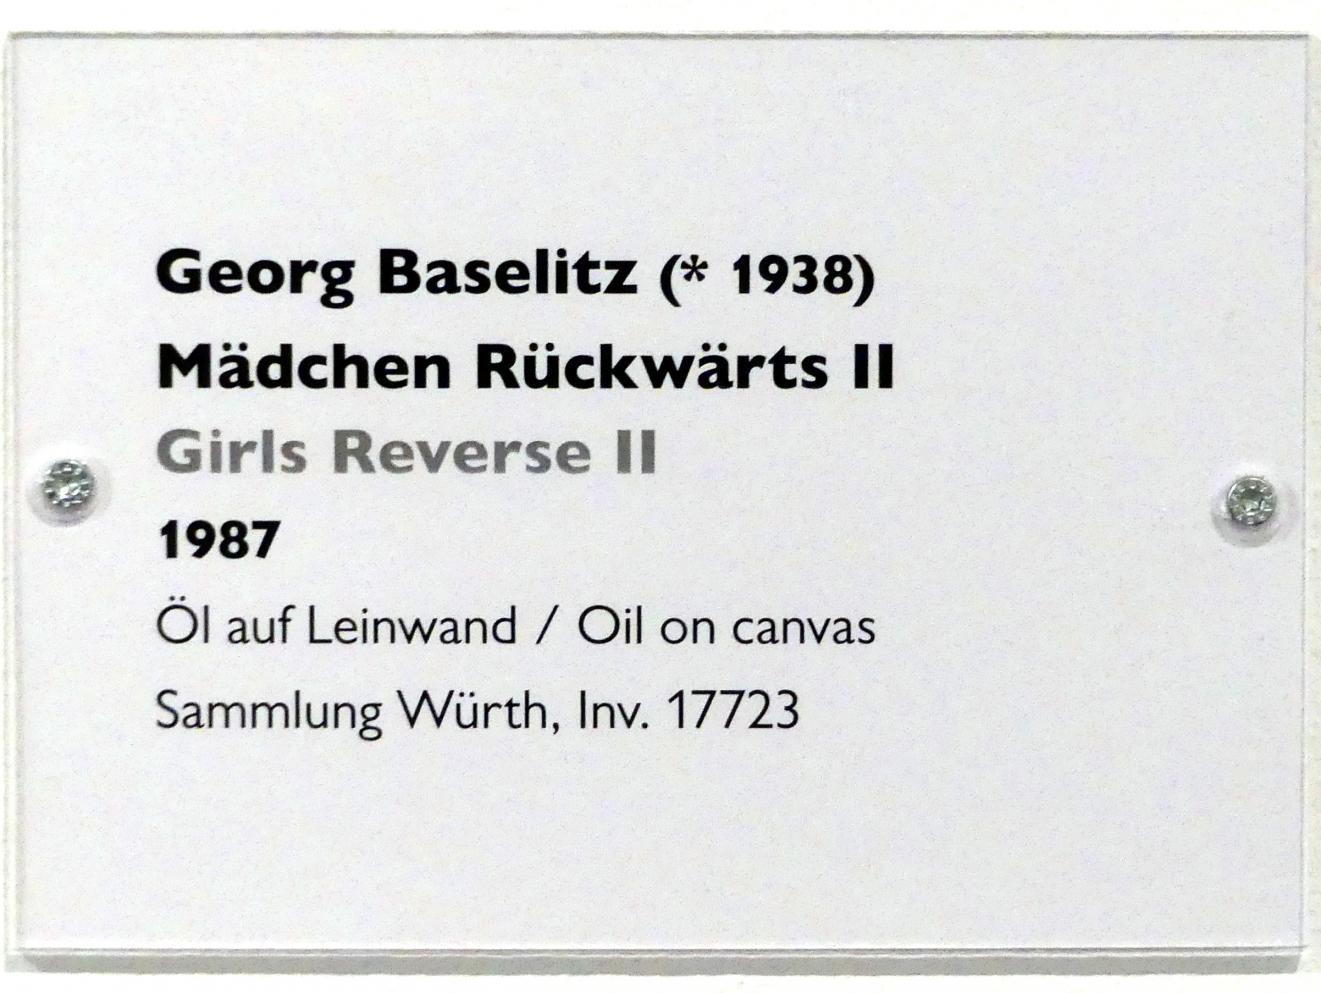 Georg Baselitz: Mädchen Rückwärts II, 1987, Bild 2/2